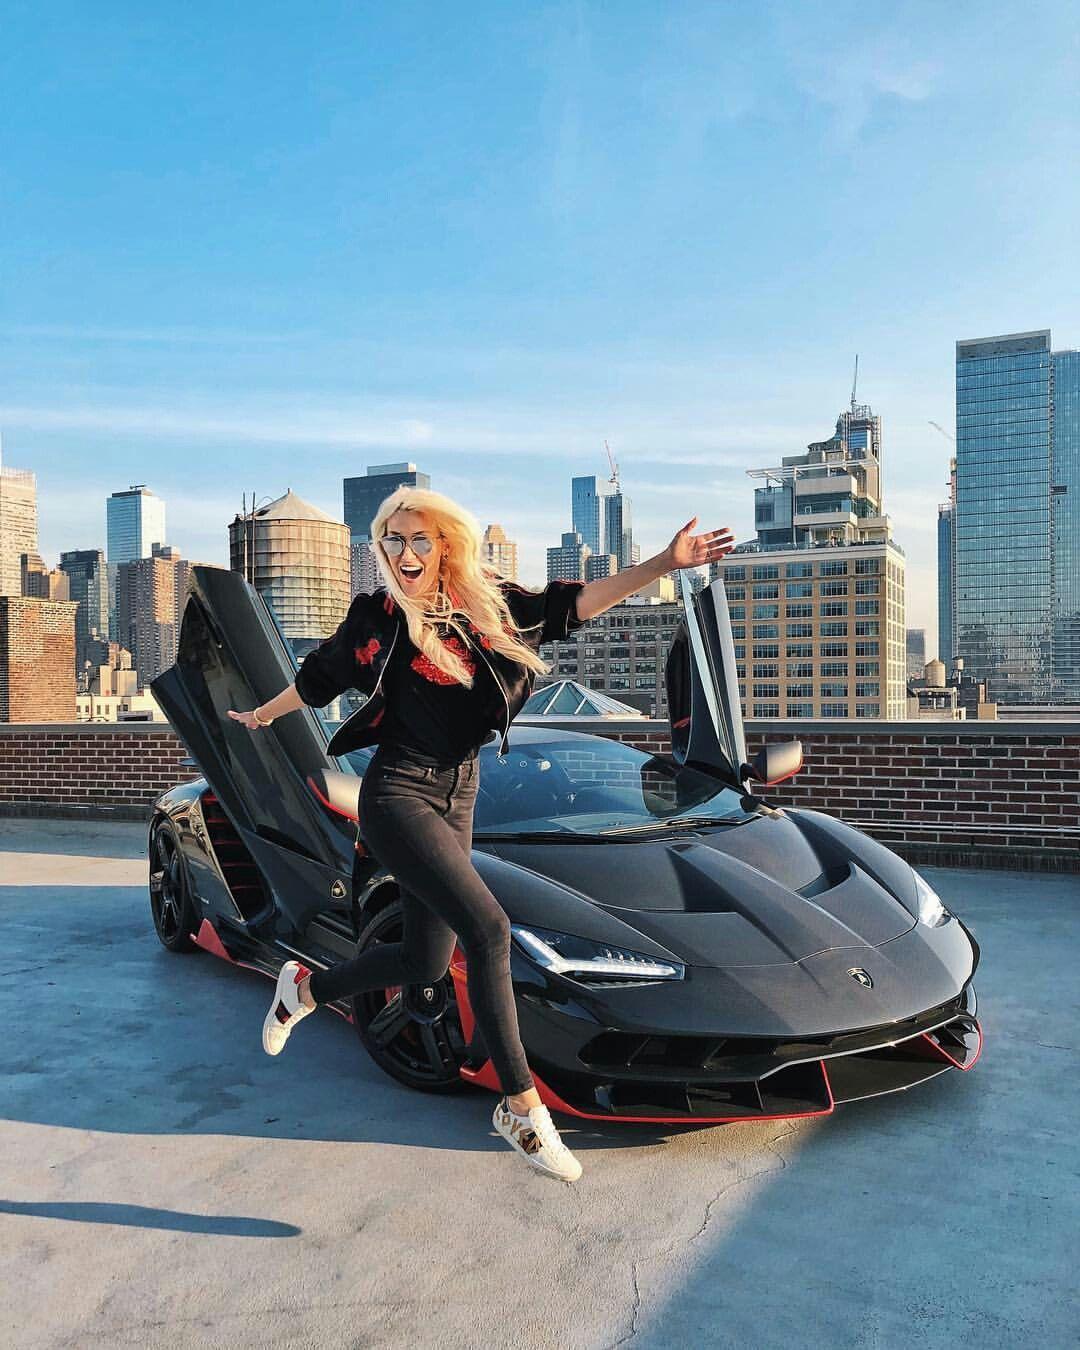 Supercarblondie Car Girls Super Cars Classy Cars